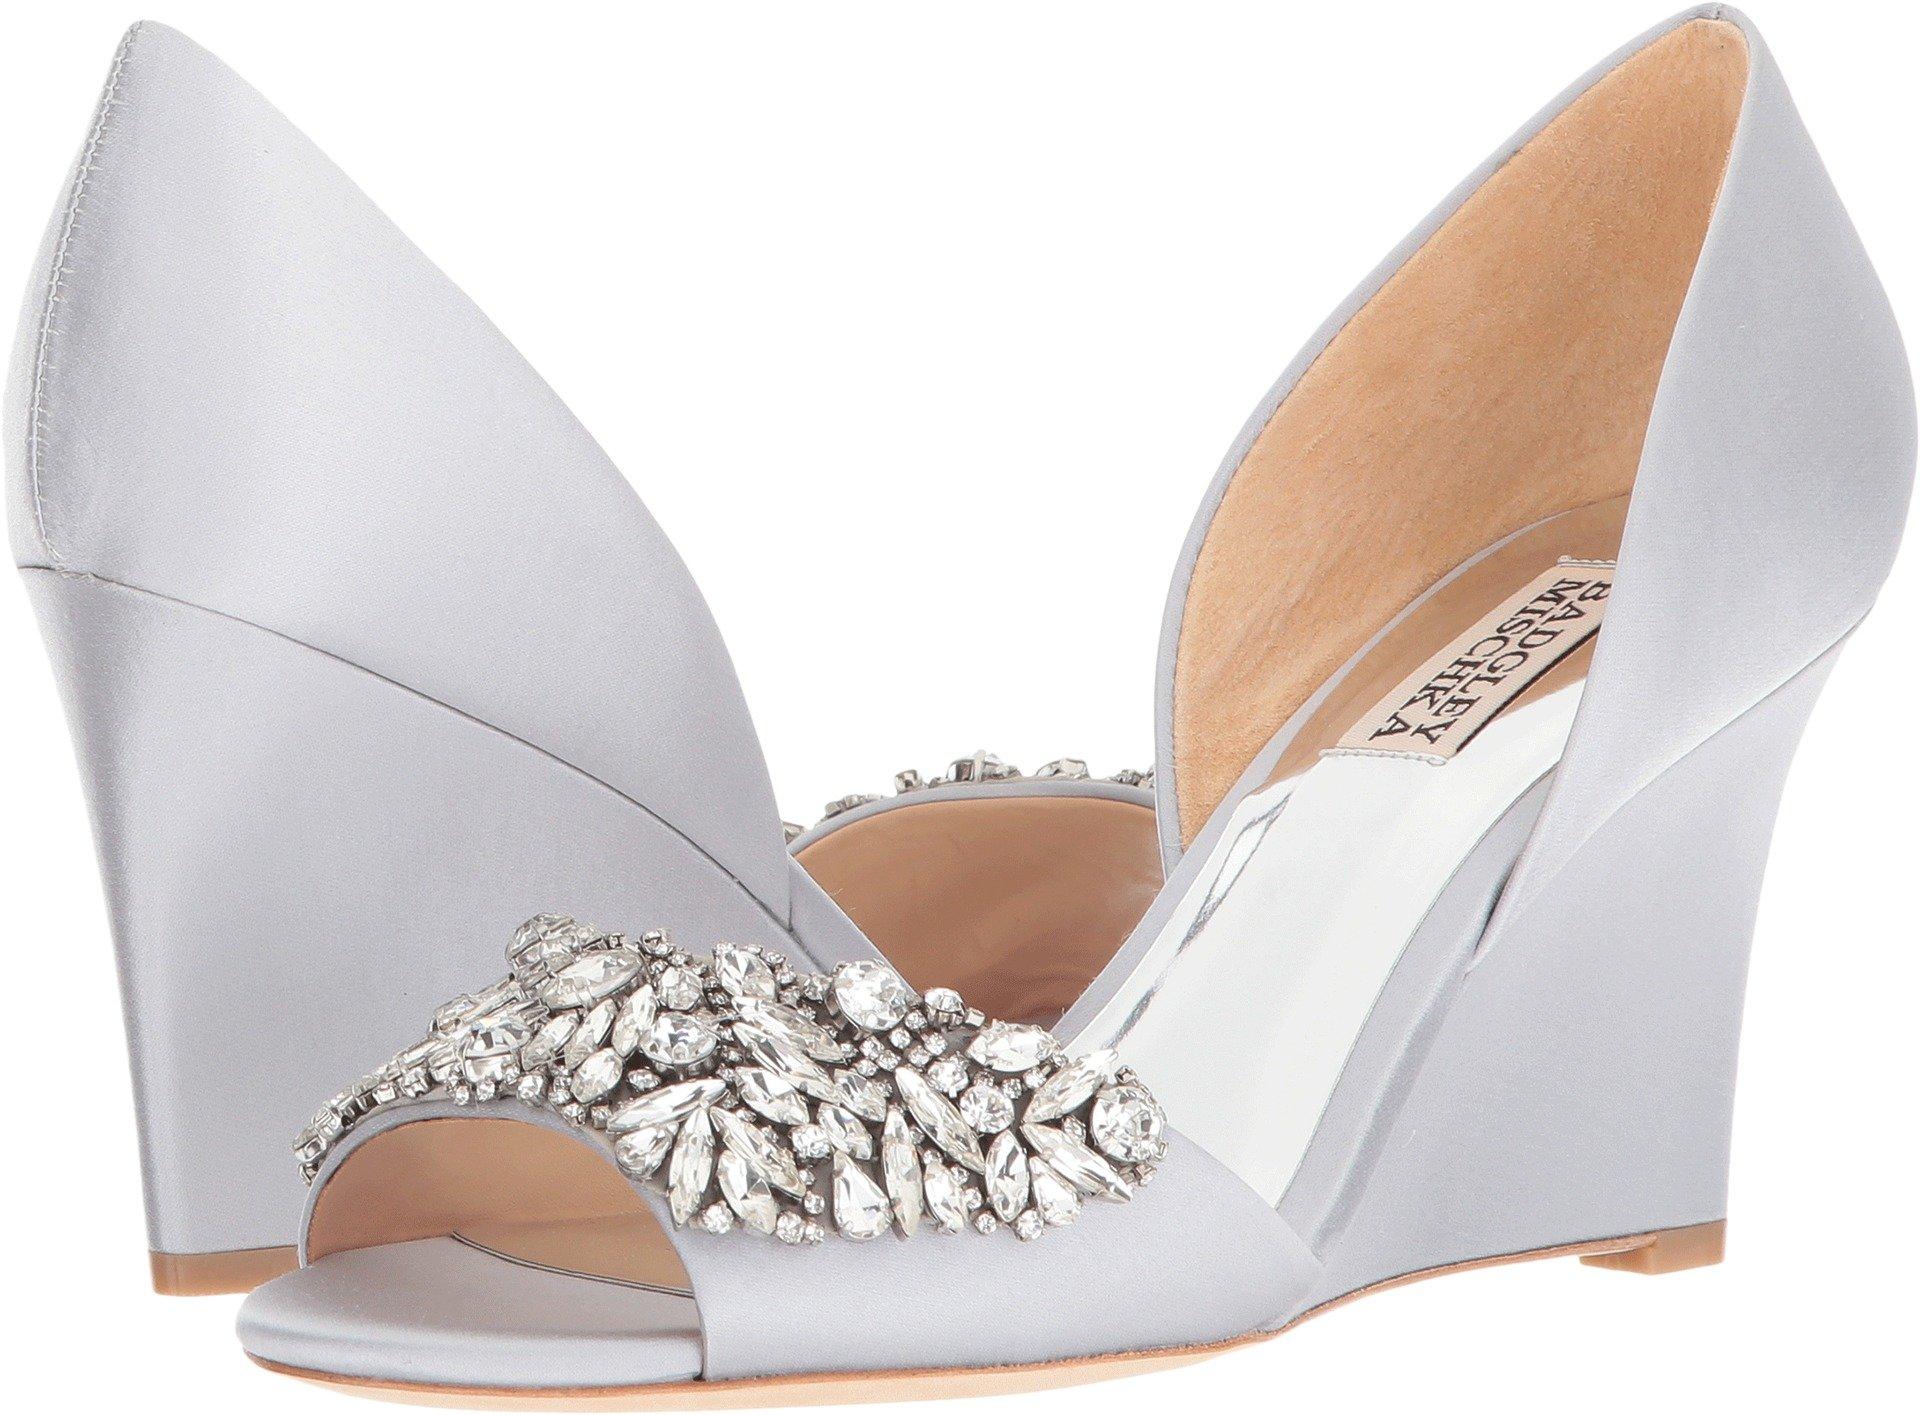 Badgley Mischka Women's Hardy Wedge Sandal, Silver, 7.5 M US